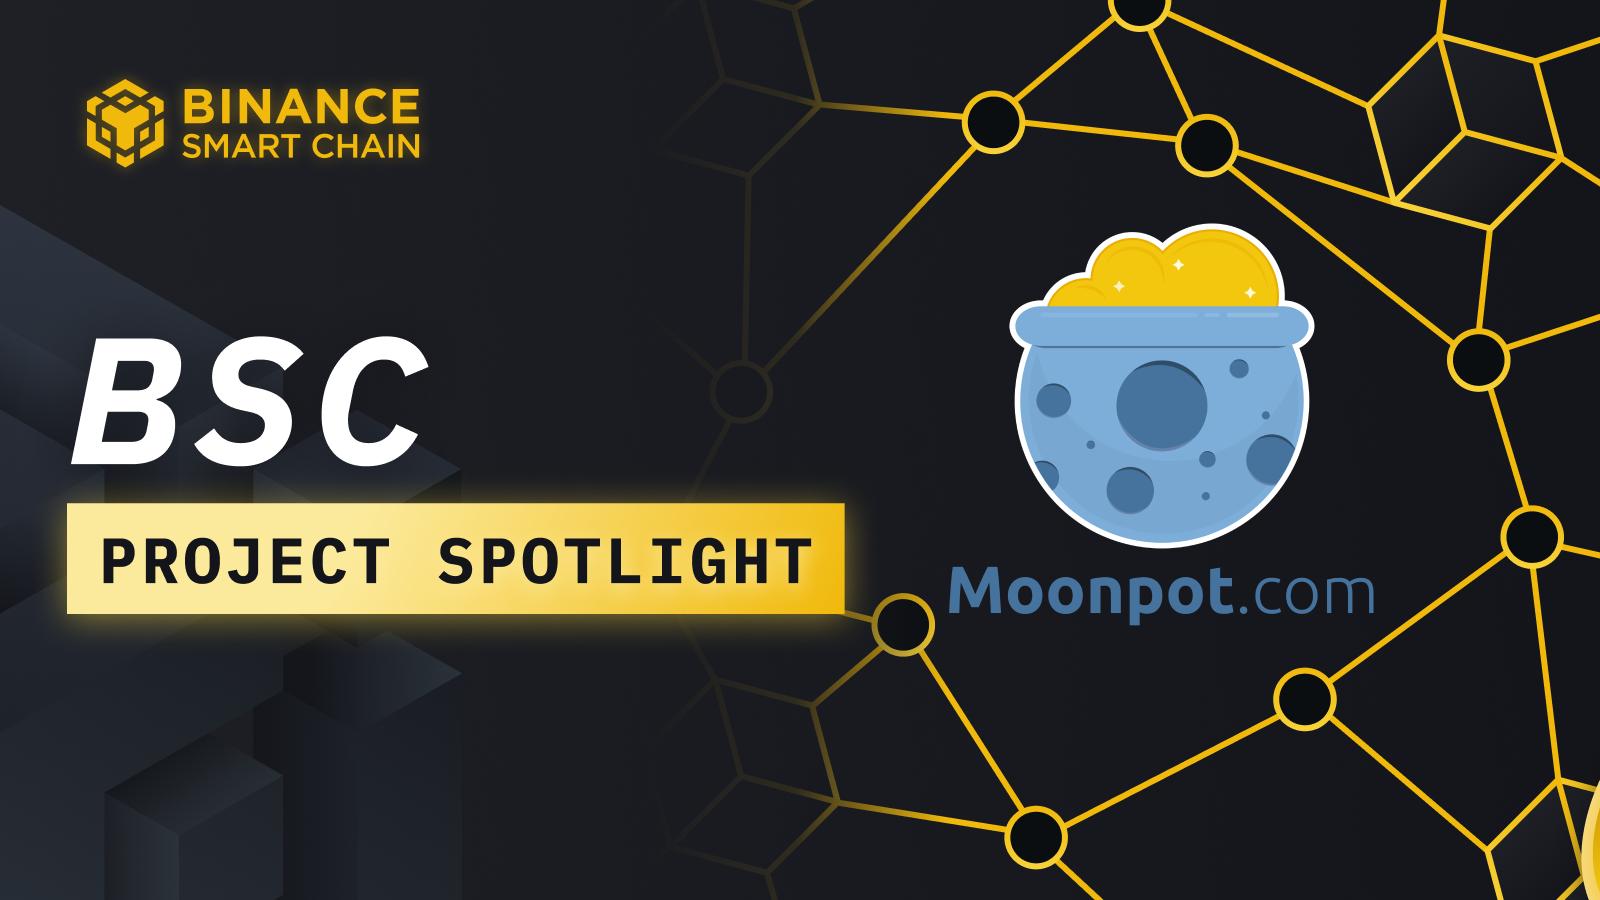 BSC Project Spotlight: Moonpot